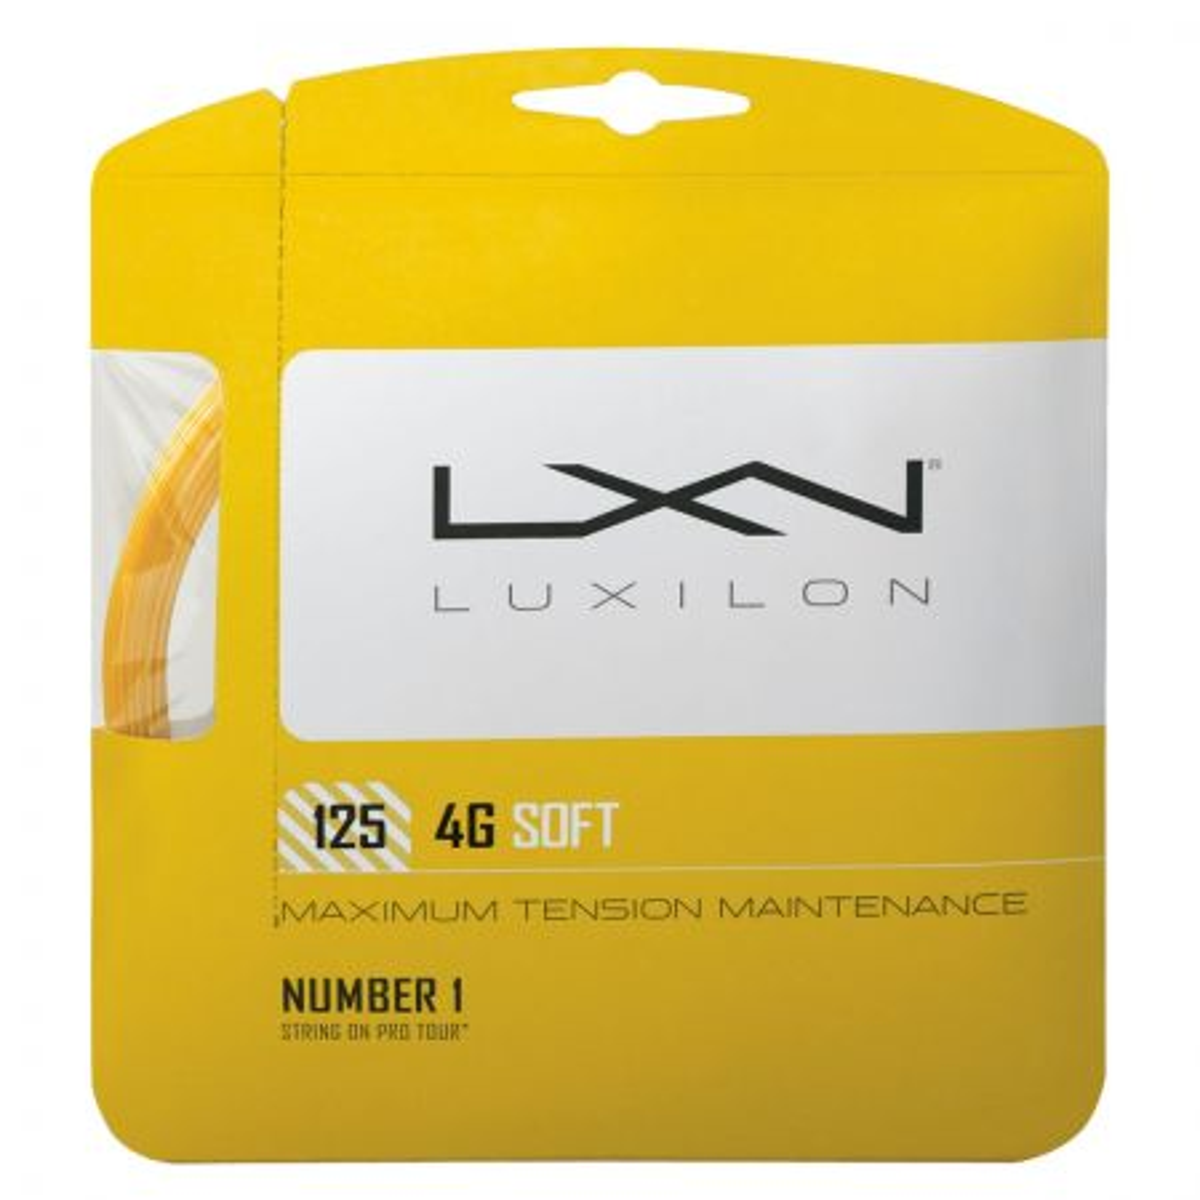 Wilson Luxilon 4g Soft 1.25mm/12.2 žica za teniske rekete